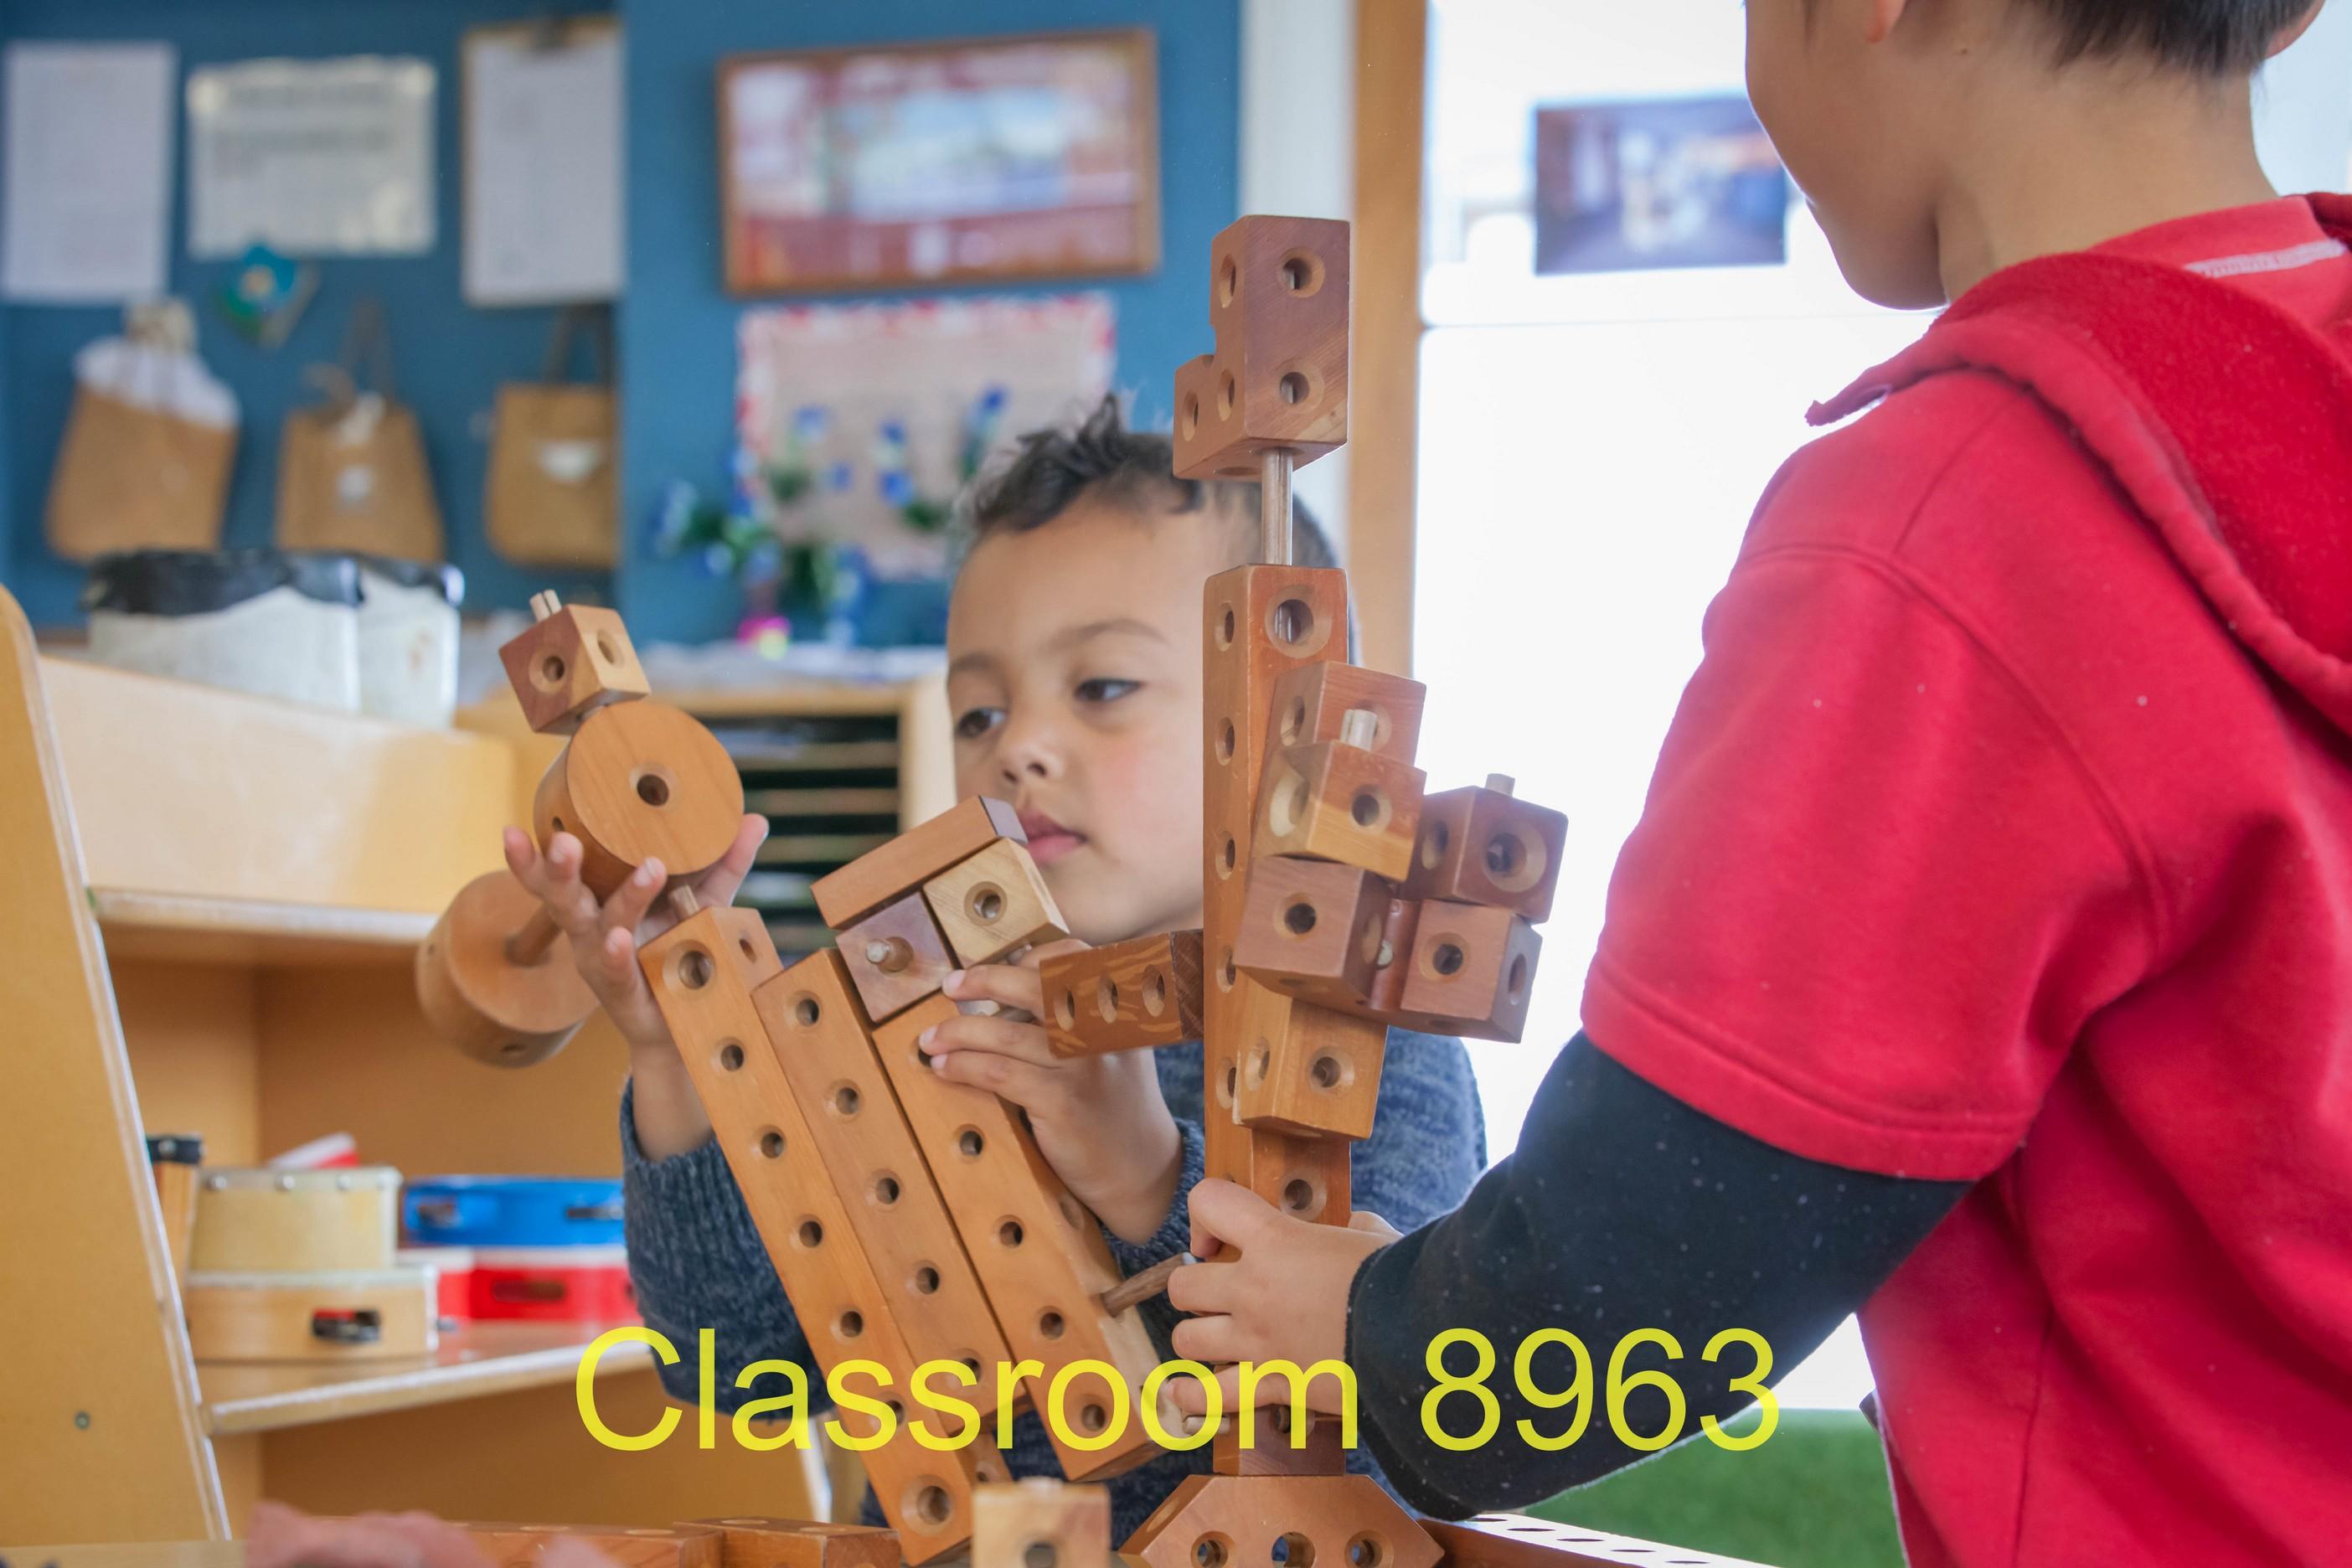 Classroom 8963